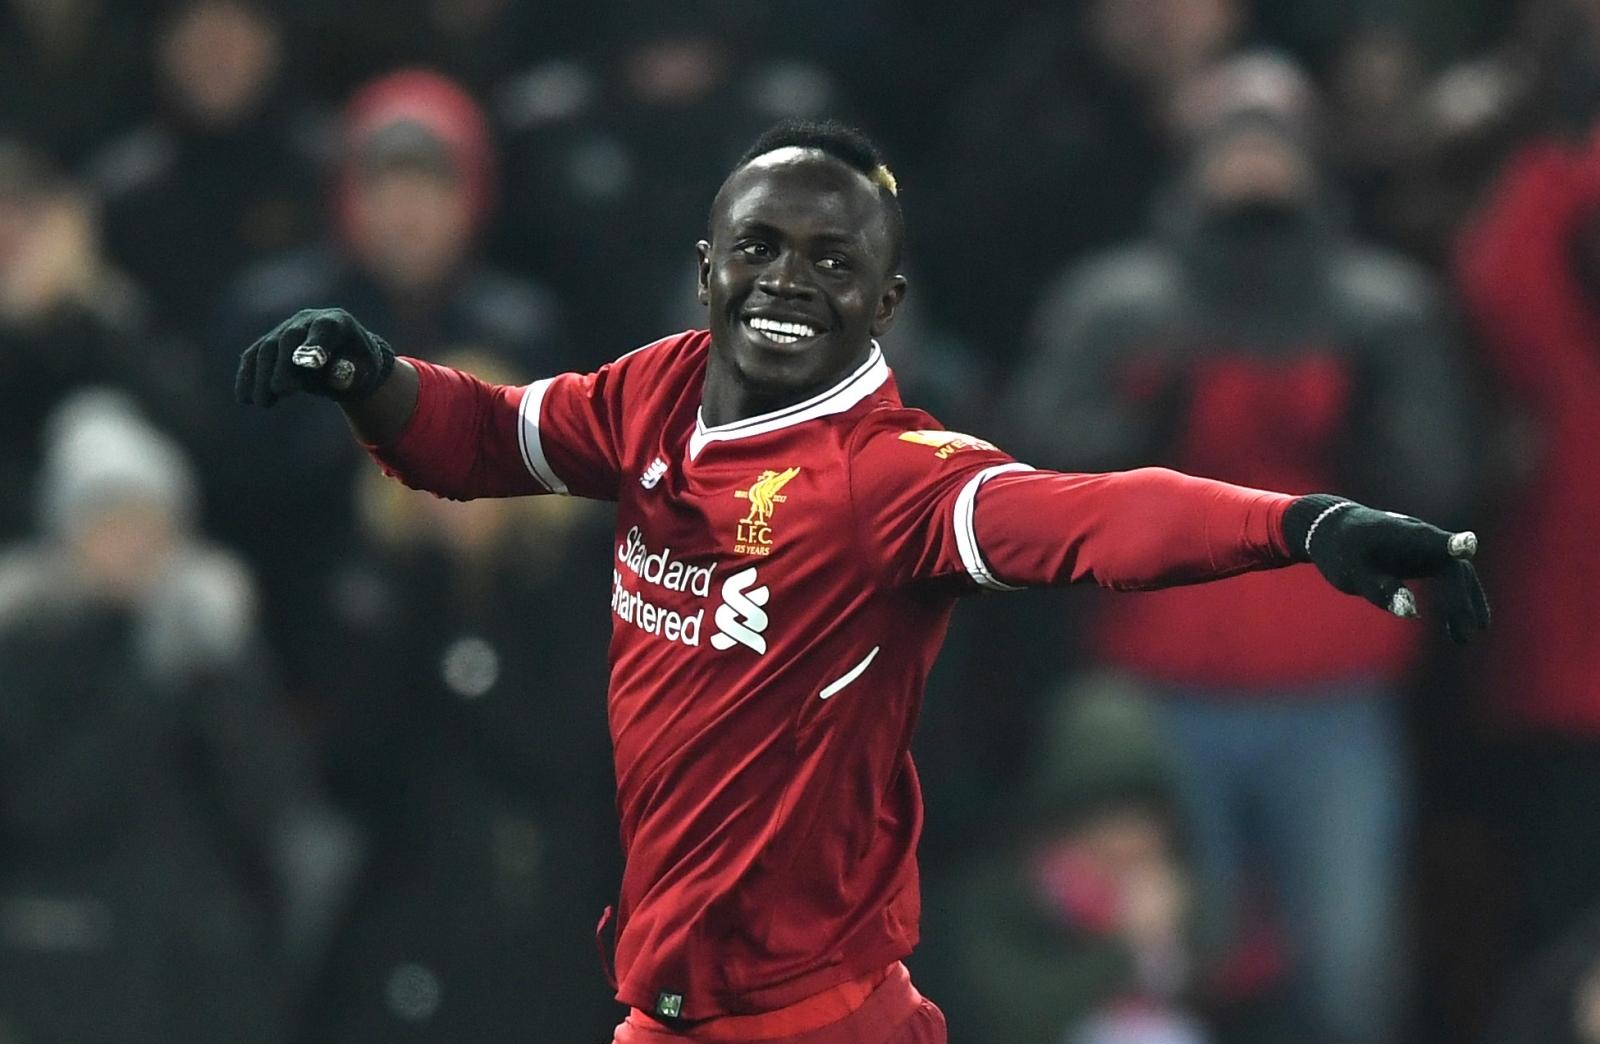 Chelsea Vs Man City: Mohamed Salah And Sadio Mane Goals Send Liverpool Second